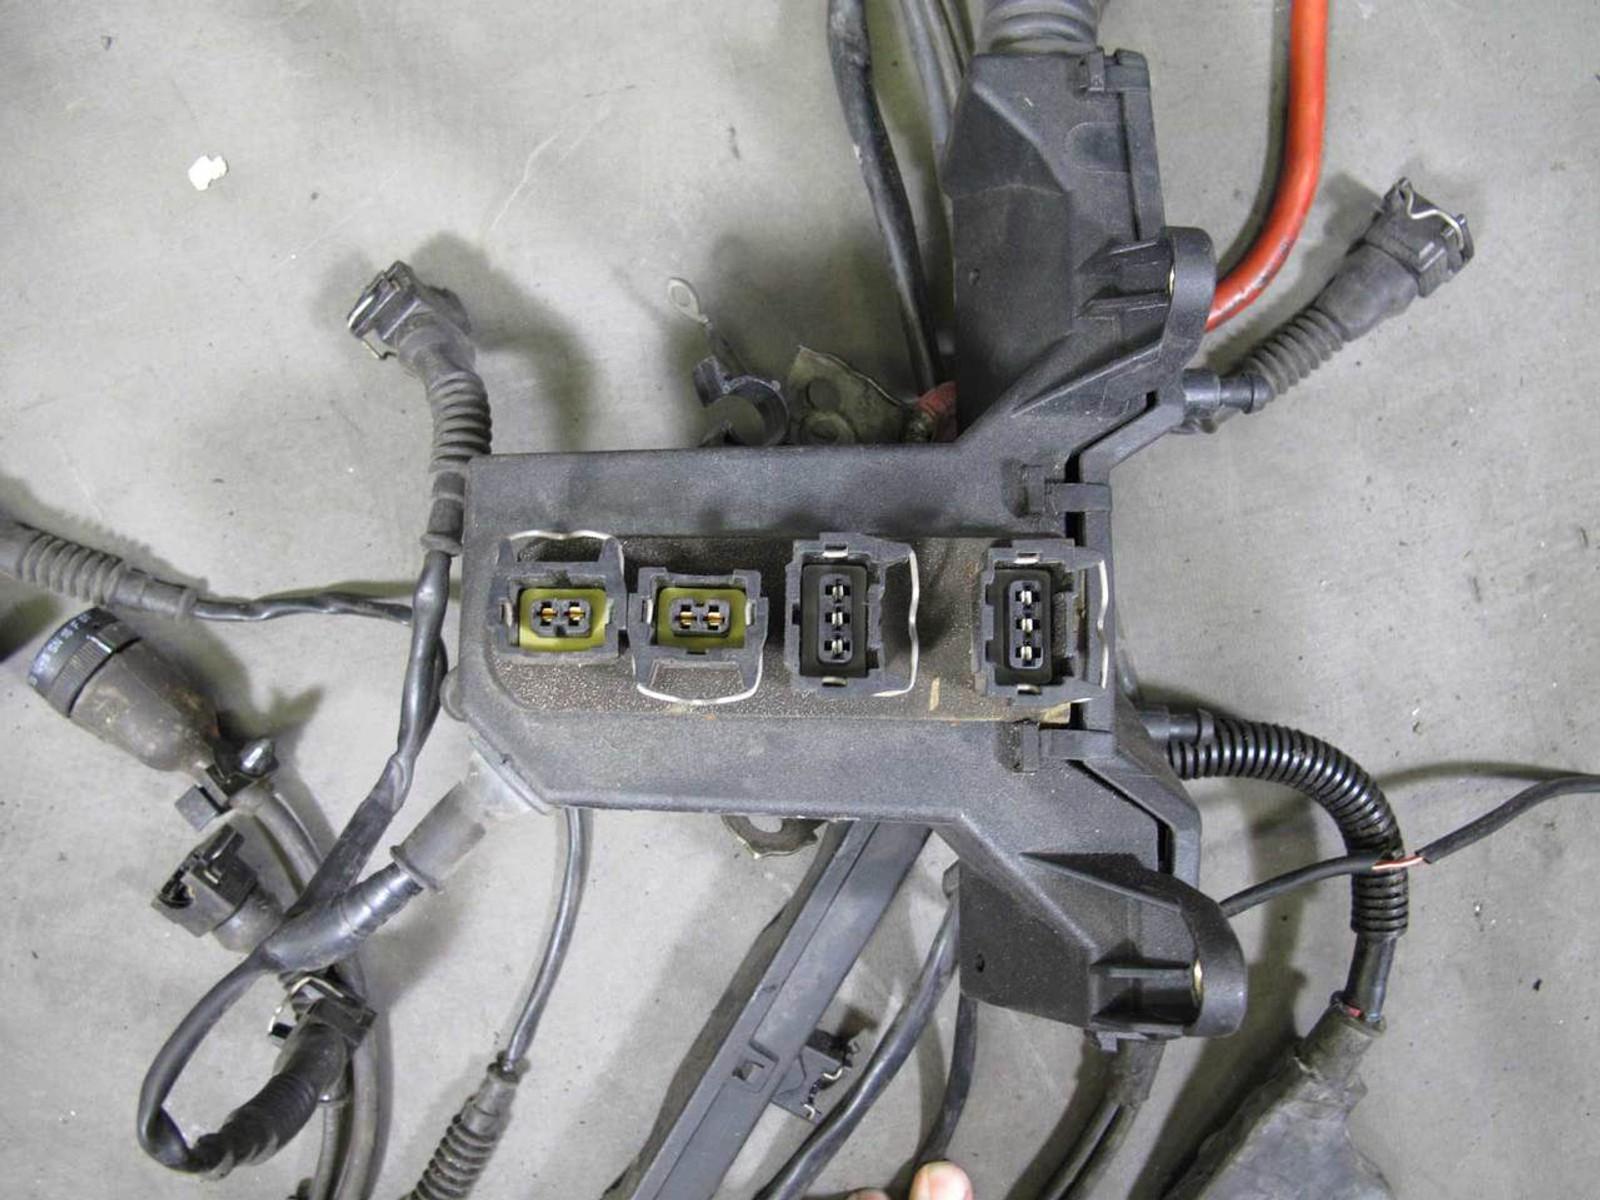 [DIAGRAM_38IS]  797C 1988 Dodge Dakota Wiring Harness | Wiring Library | 1988 Dodge Dakota Wiring Harness |  | Wiring Library